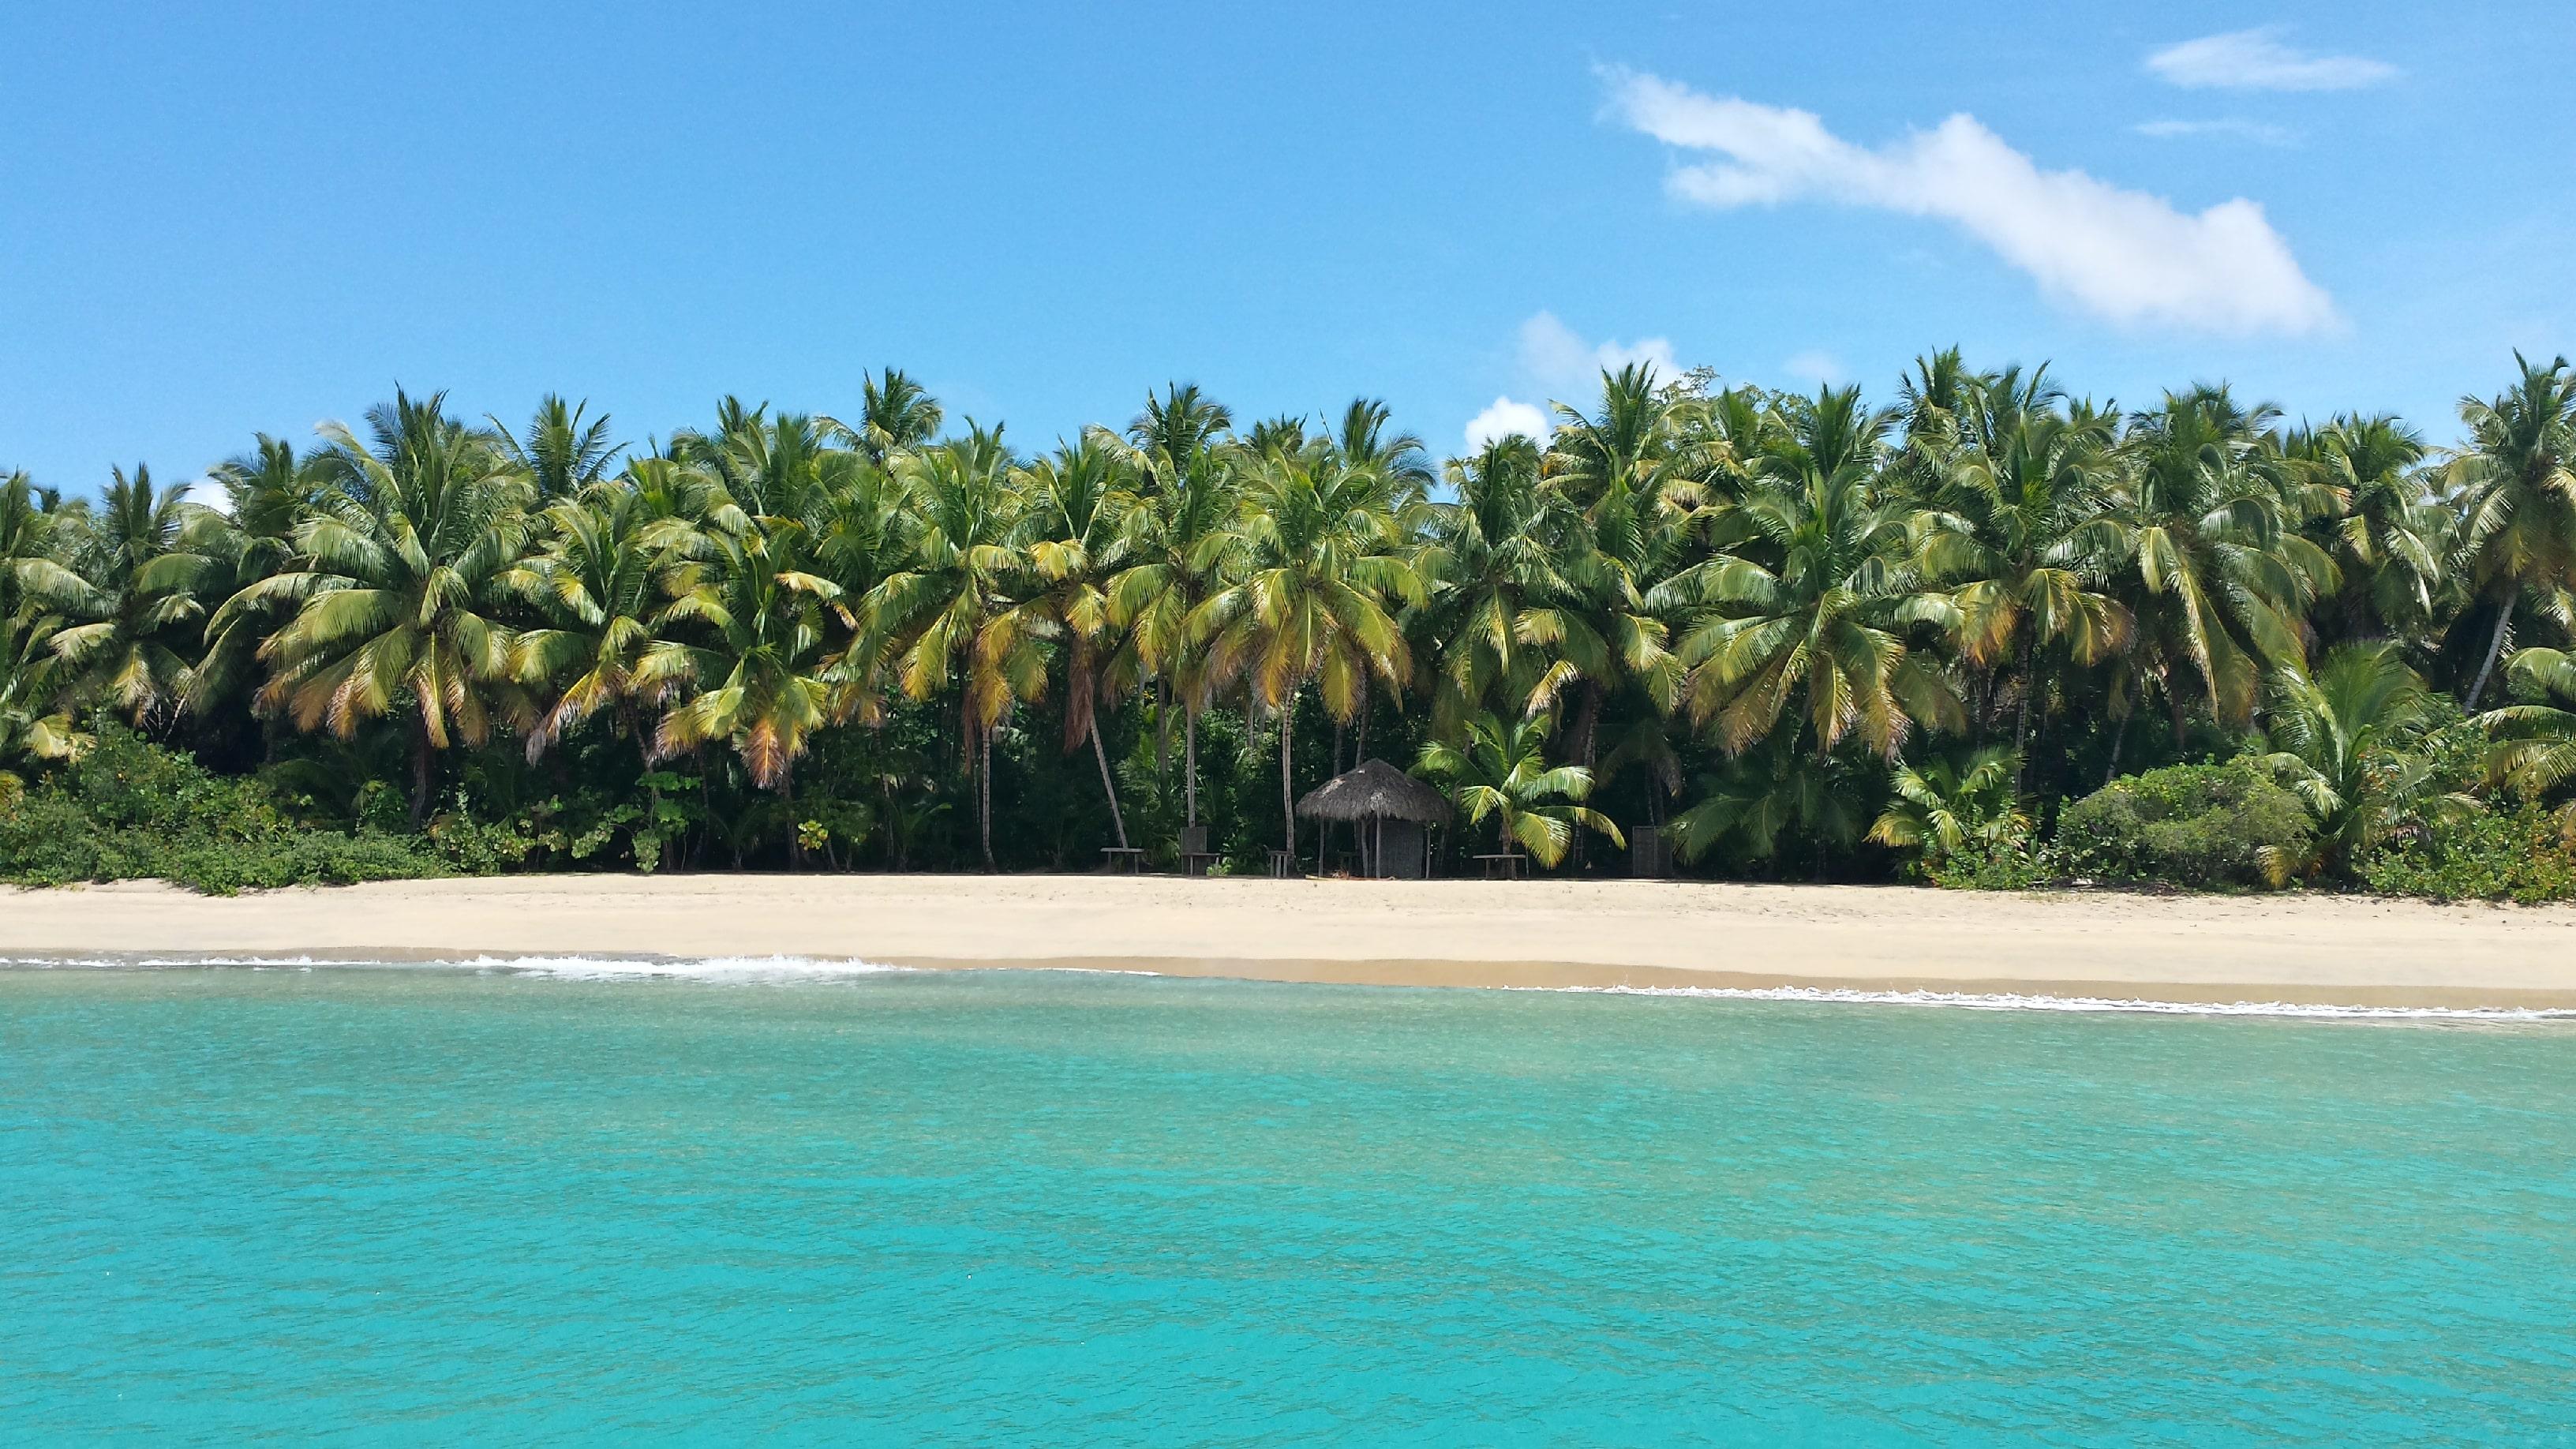 5.Playa Esmeralda